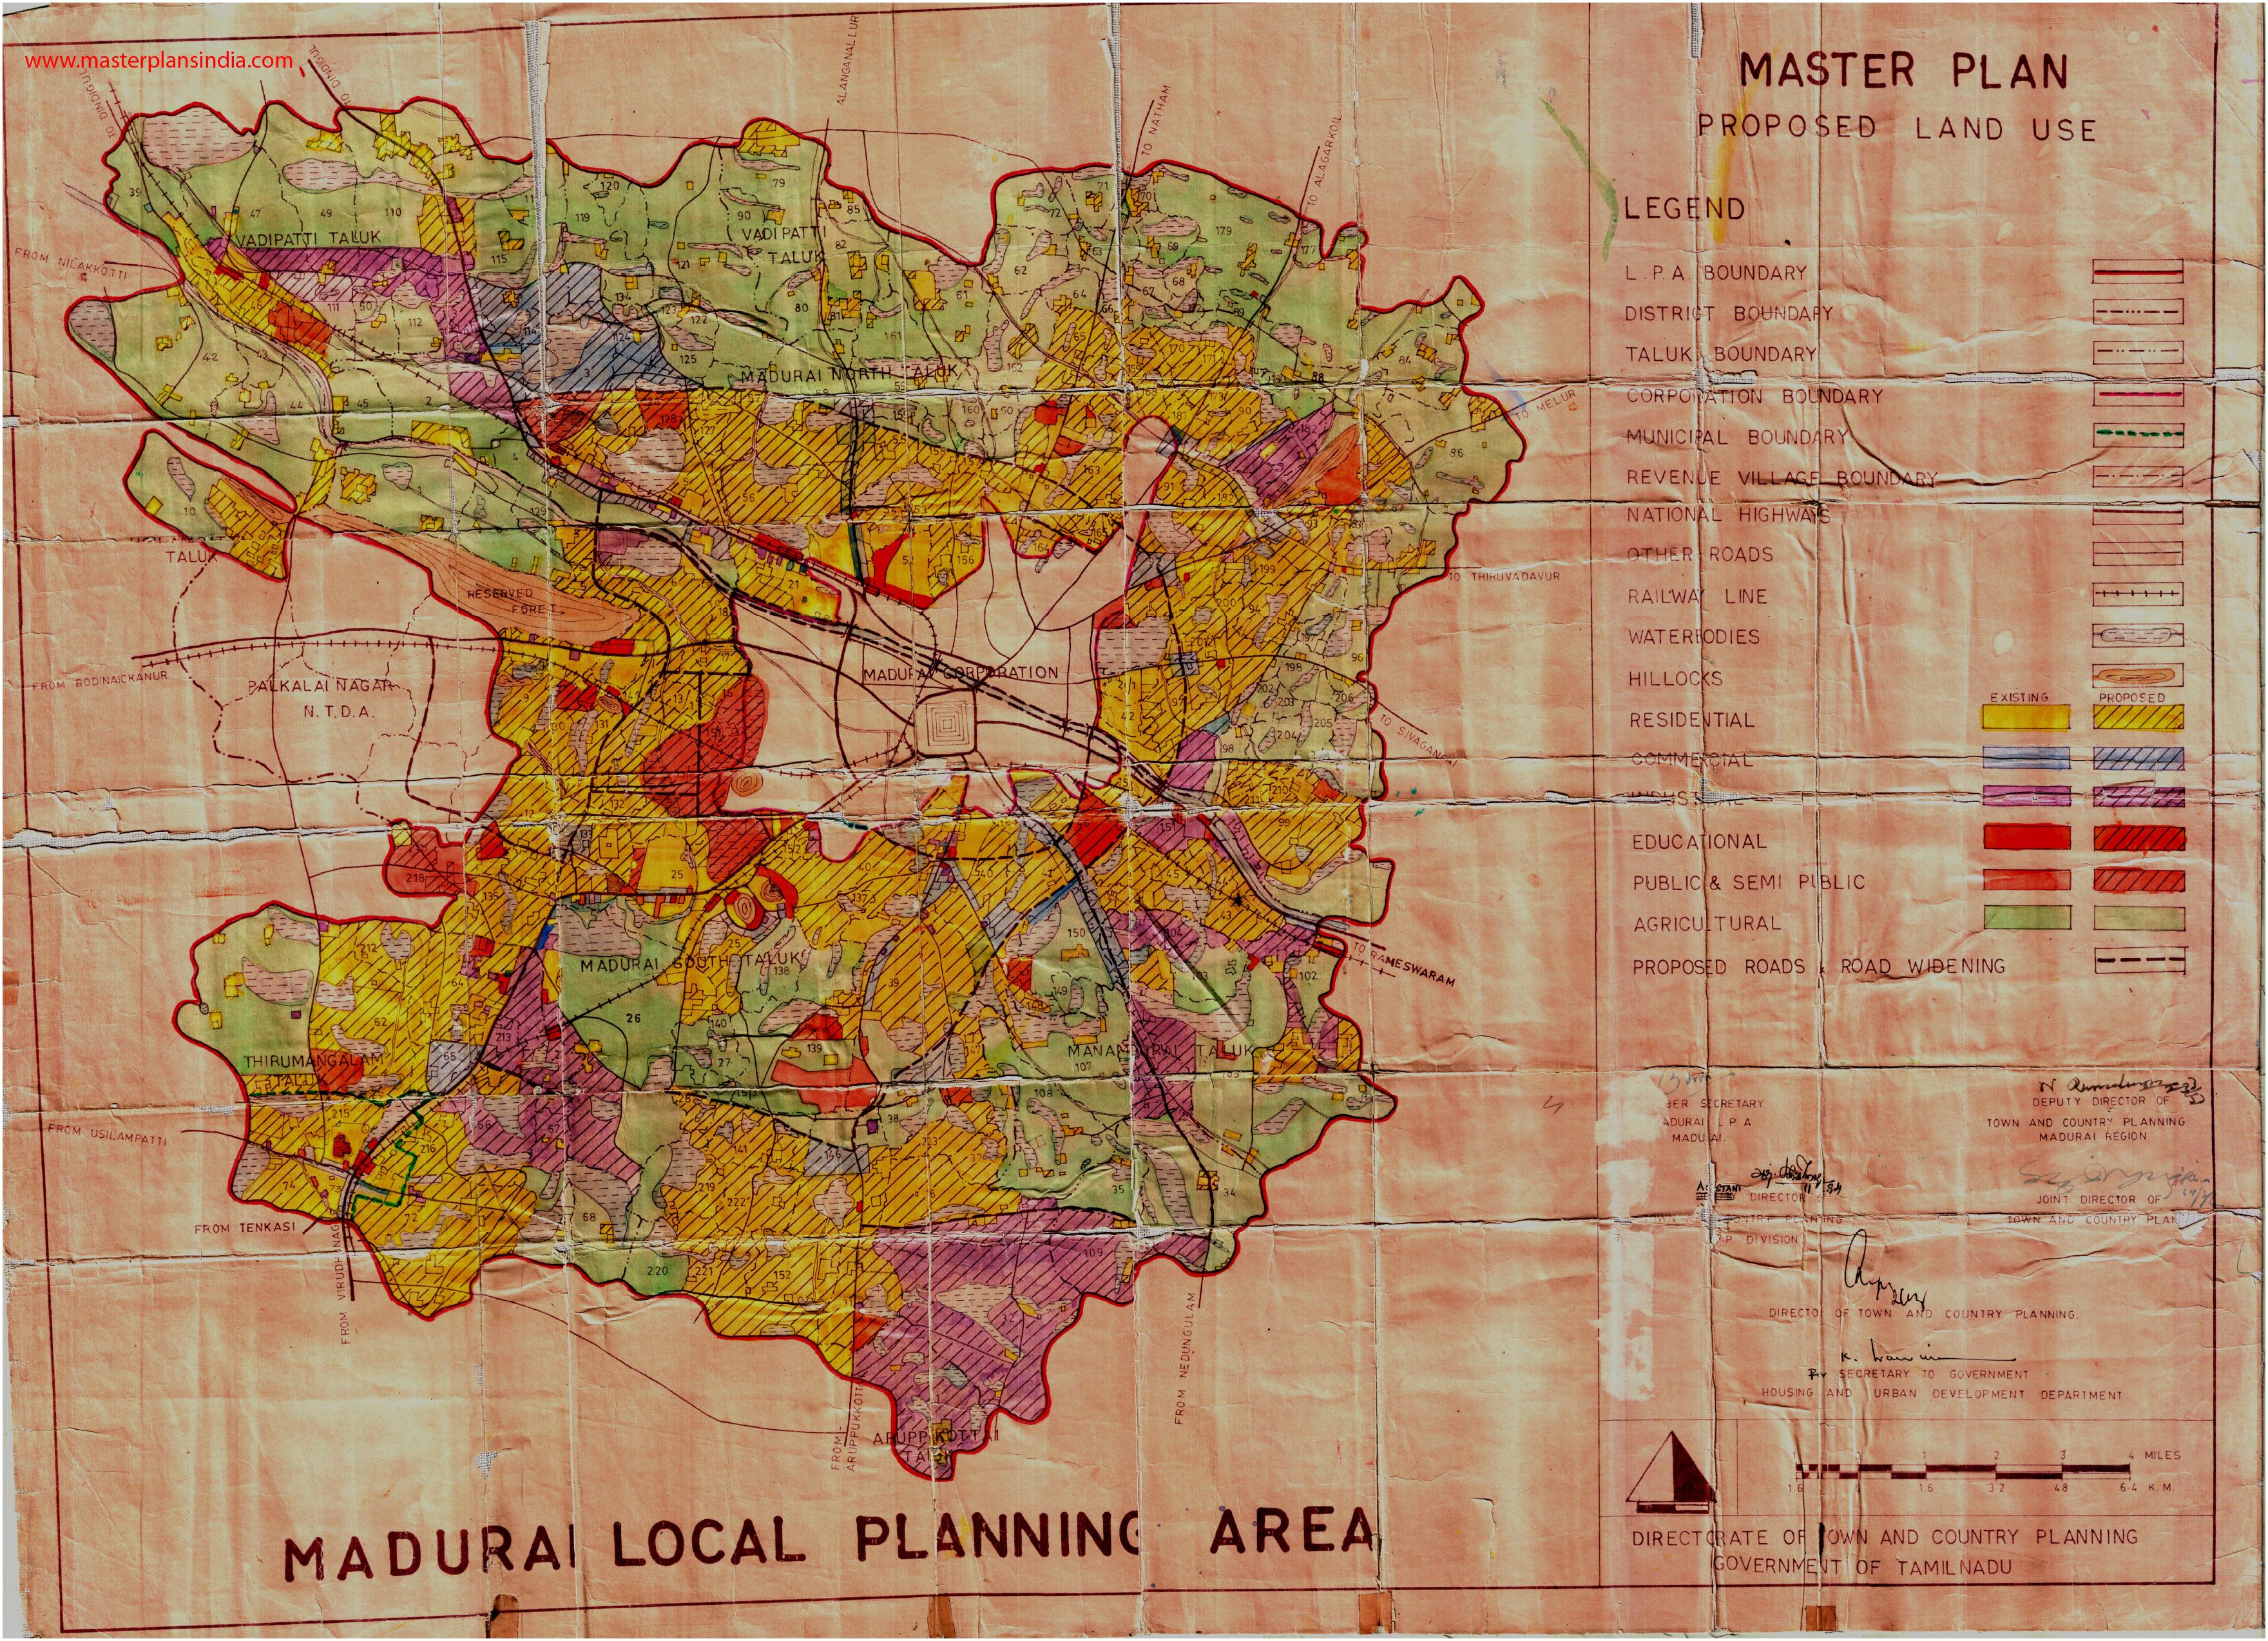 Madurai LPA Master Plan Map, Local Planning Area PDF ... on uttaranchal india map, khammam india map, kolkota india map, char dham india map, andaman and nicobar islands india map, karimnagar india map, pondicherry india map, jamshedpur india map, nabha india map, vellore india map, sagar india map, neemrana india map, chennai india map, kanpur india map, balasore india map, kanker india map, hyderabad india map, bikaner india map, ludhiana india map, kanchi india map,